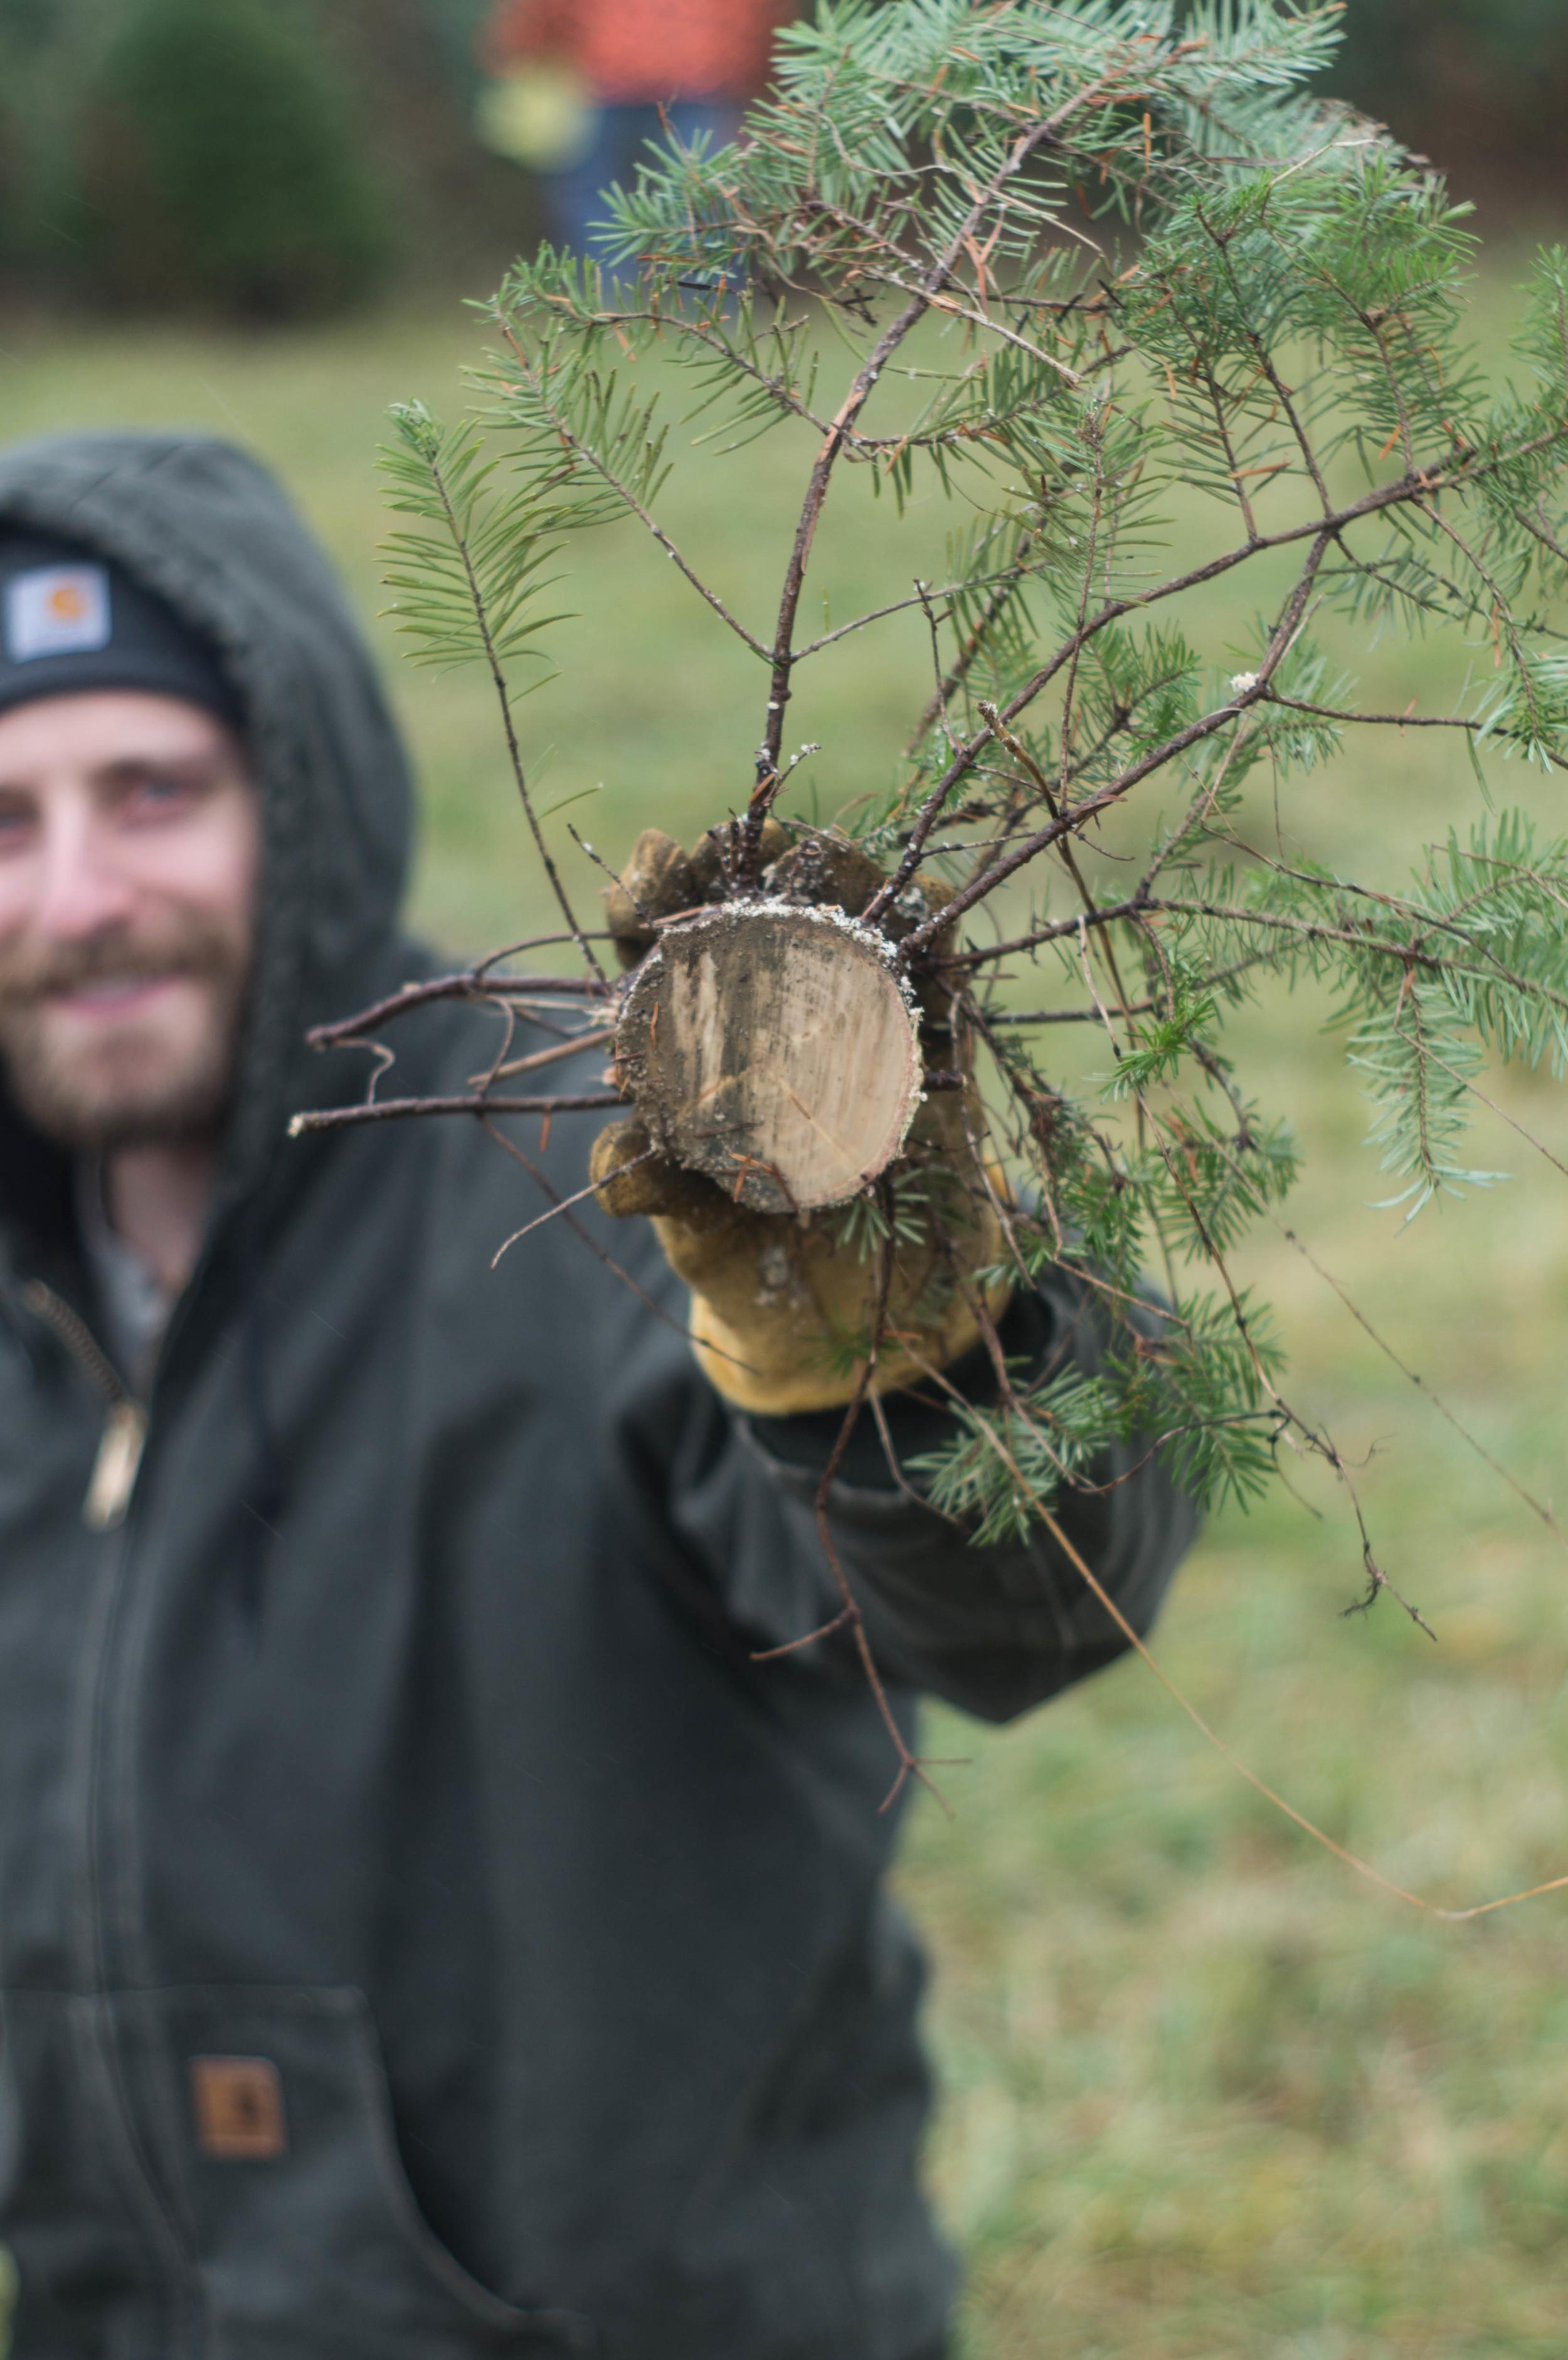 brother-holding-tree-stump